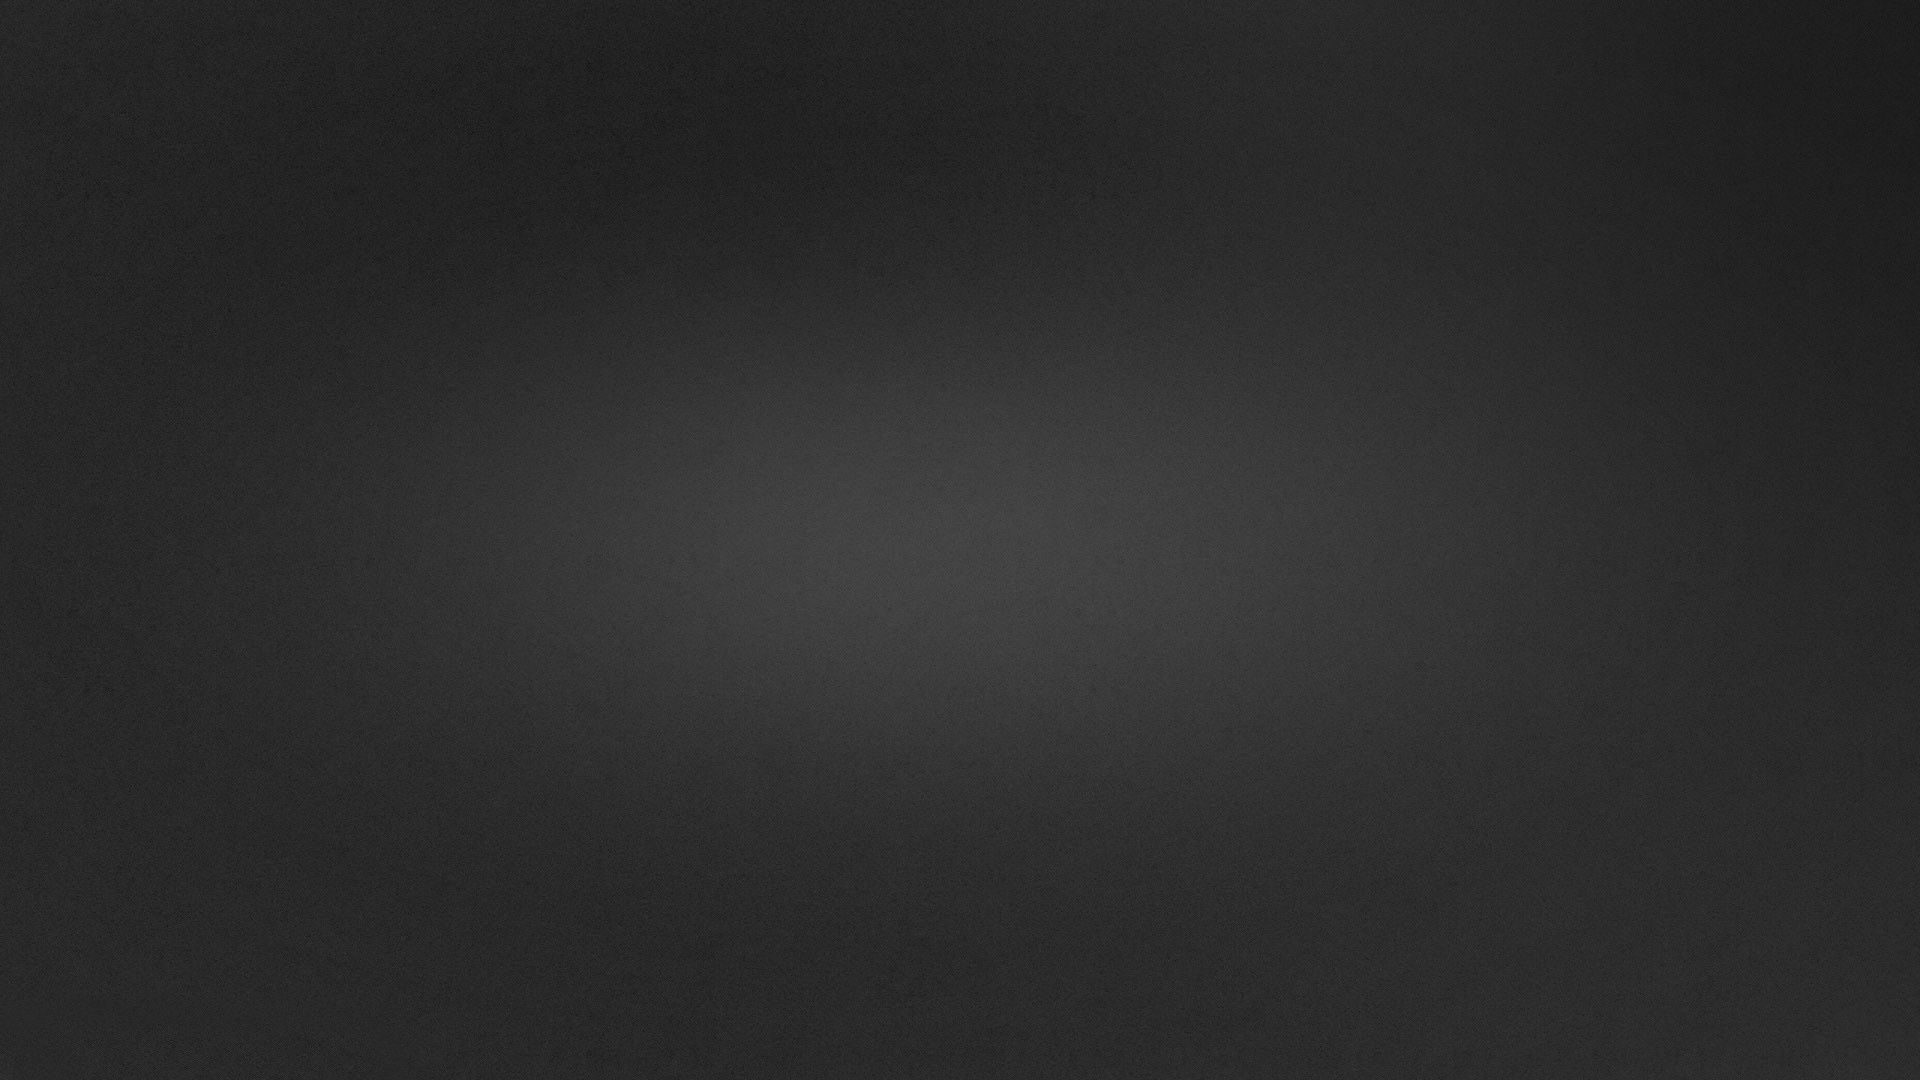 HD wallpapers iphone 4s wallpaper stock